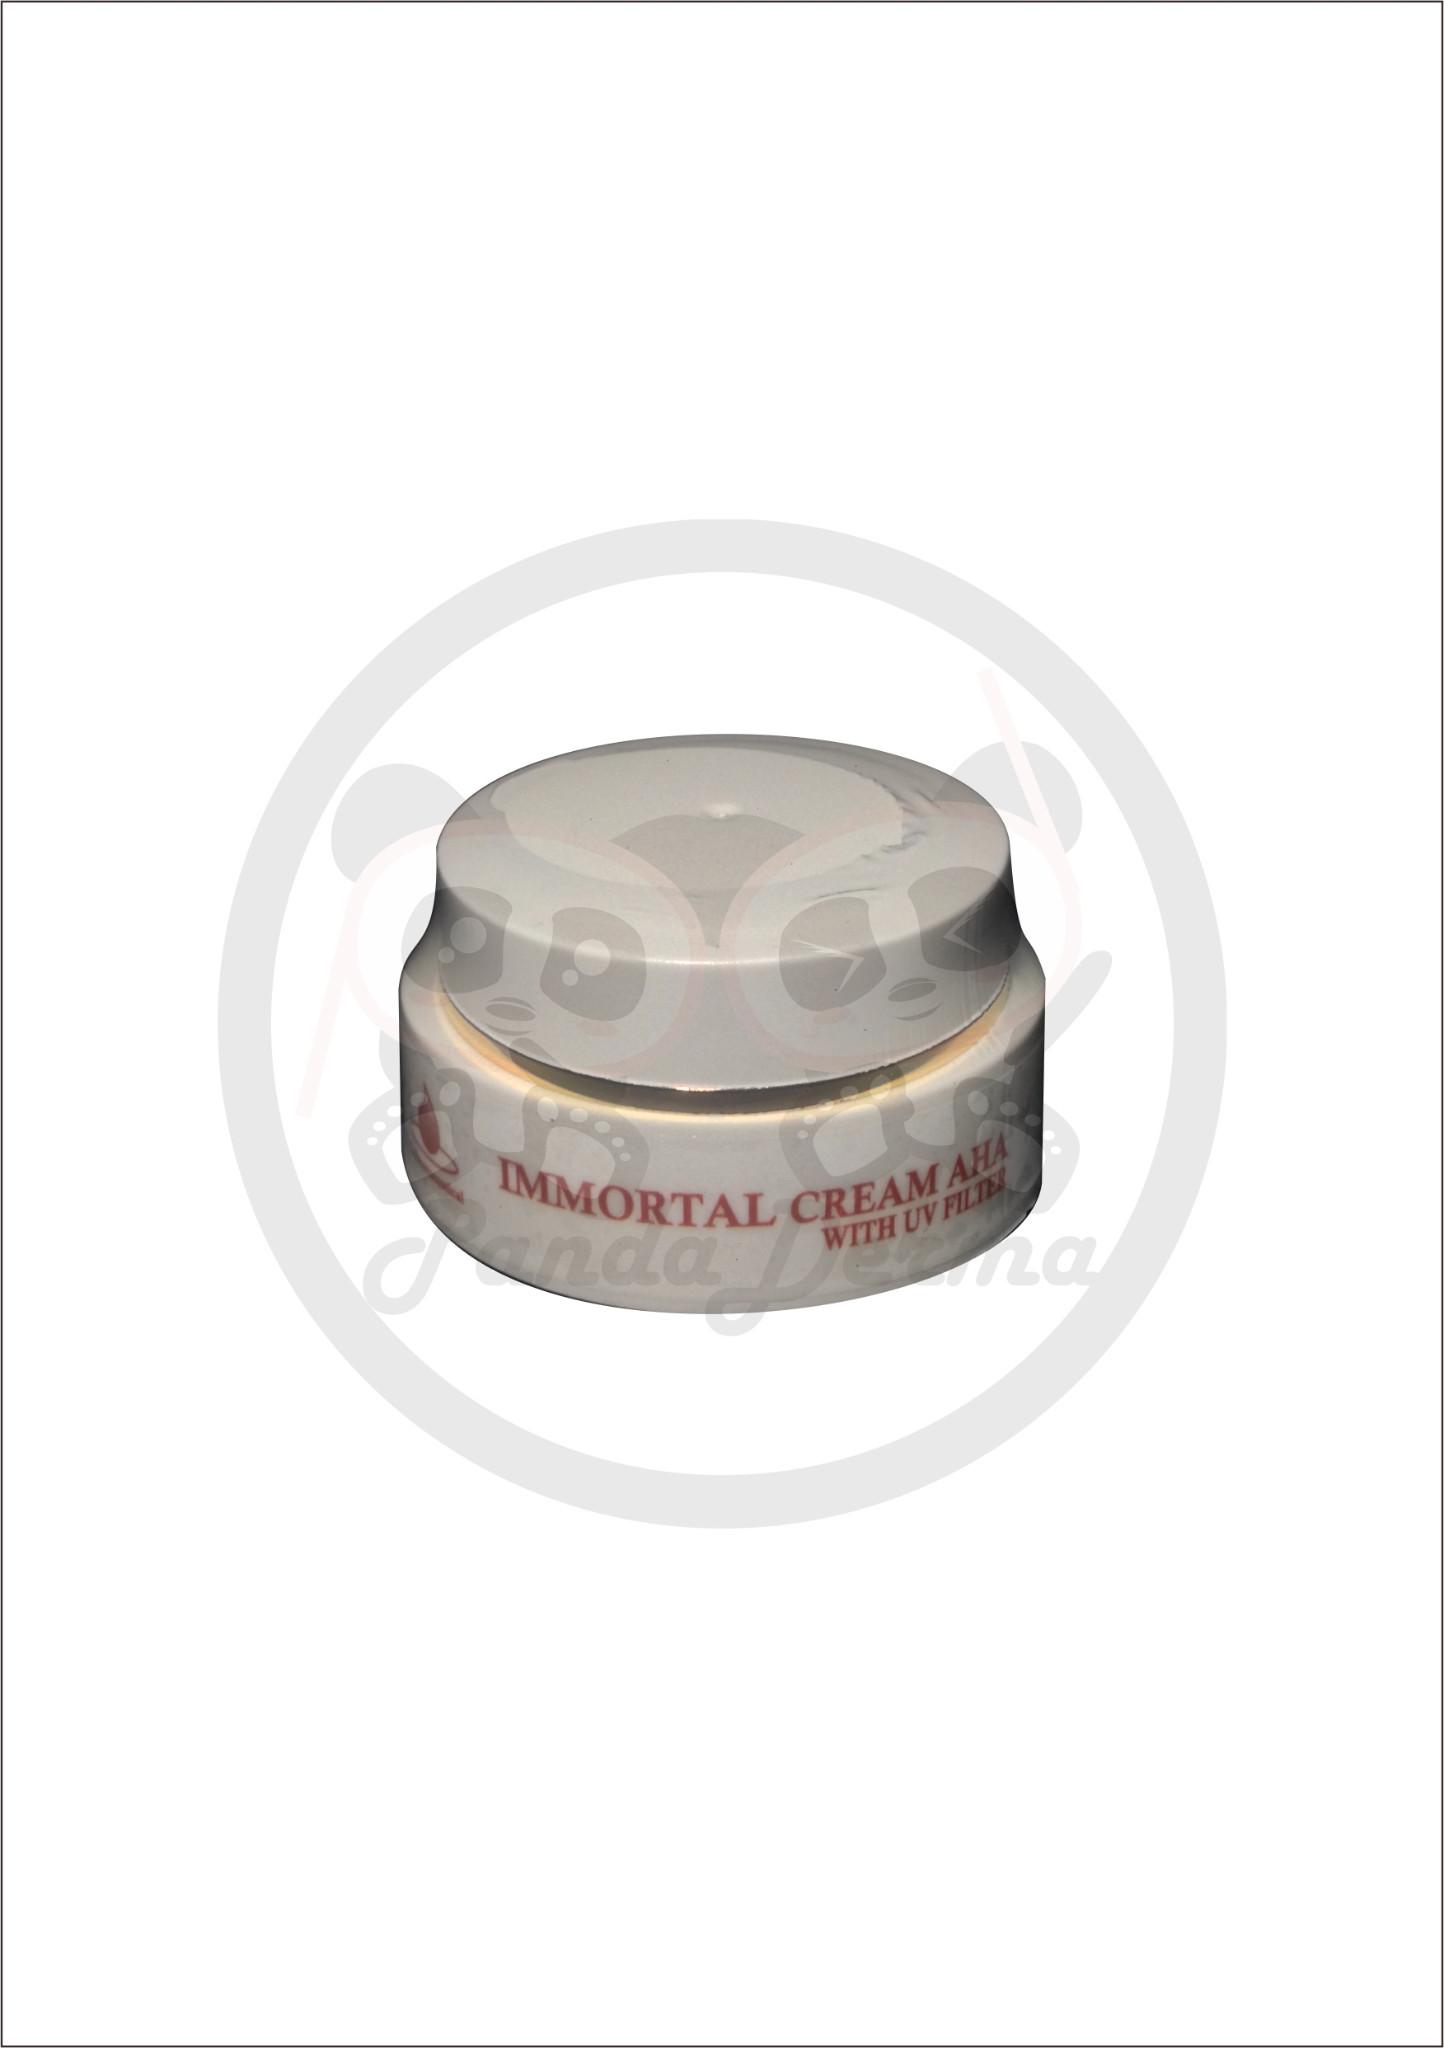 Jual Immortal Cream AHA With UV Filter Tabir Surya Anti